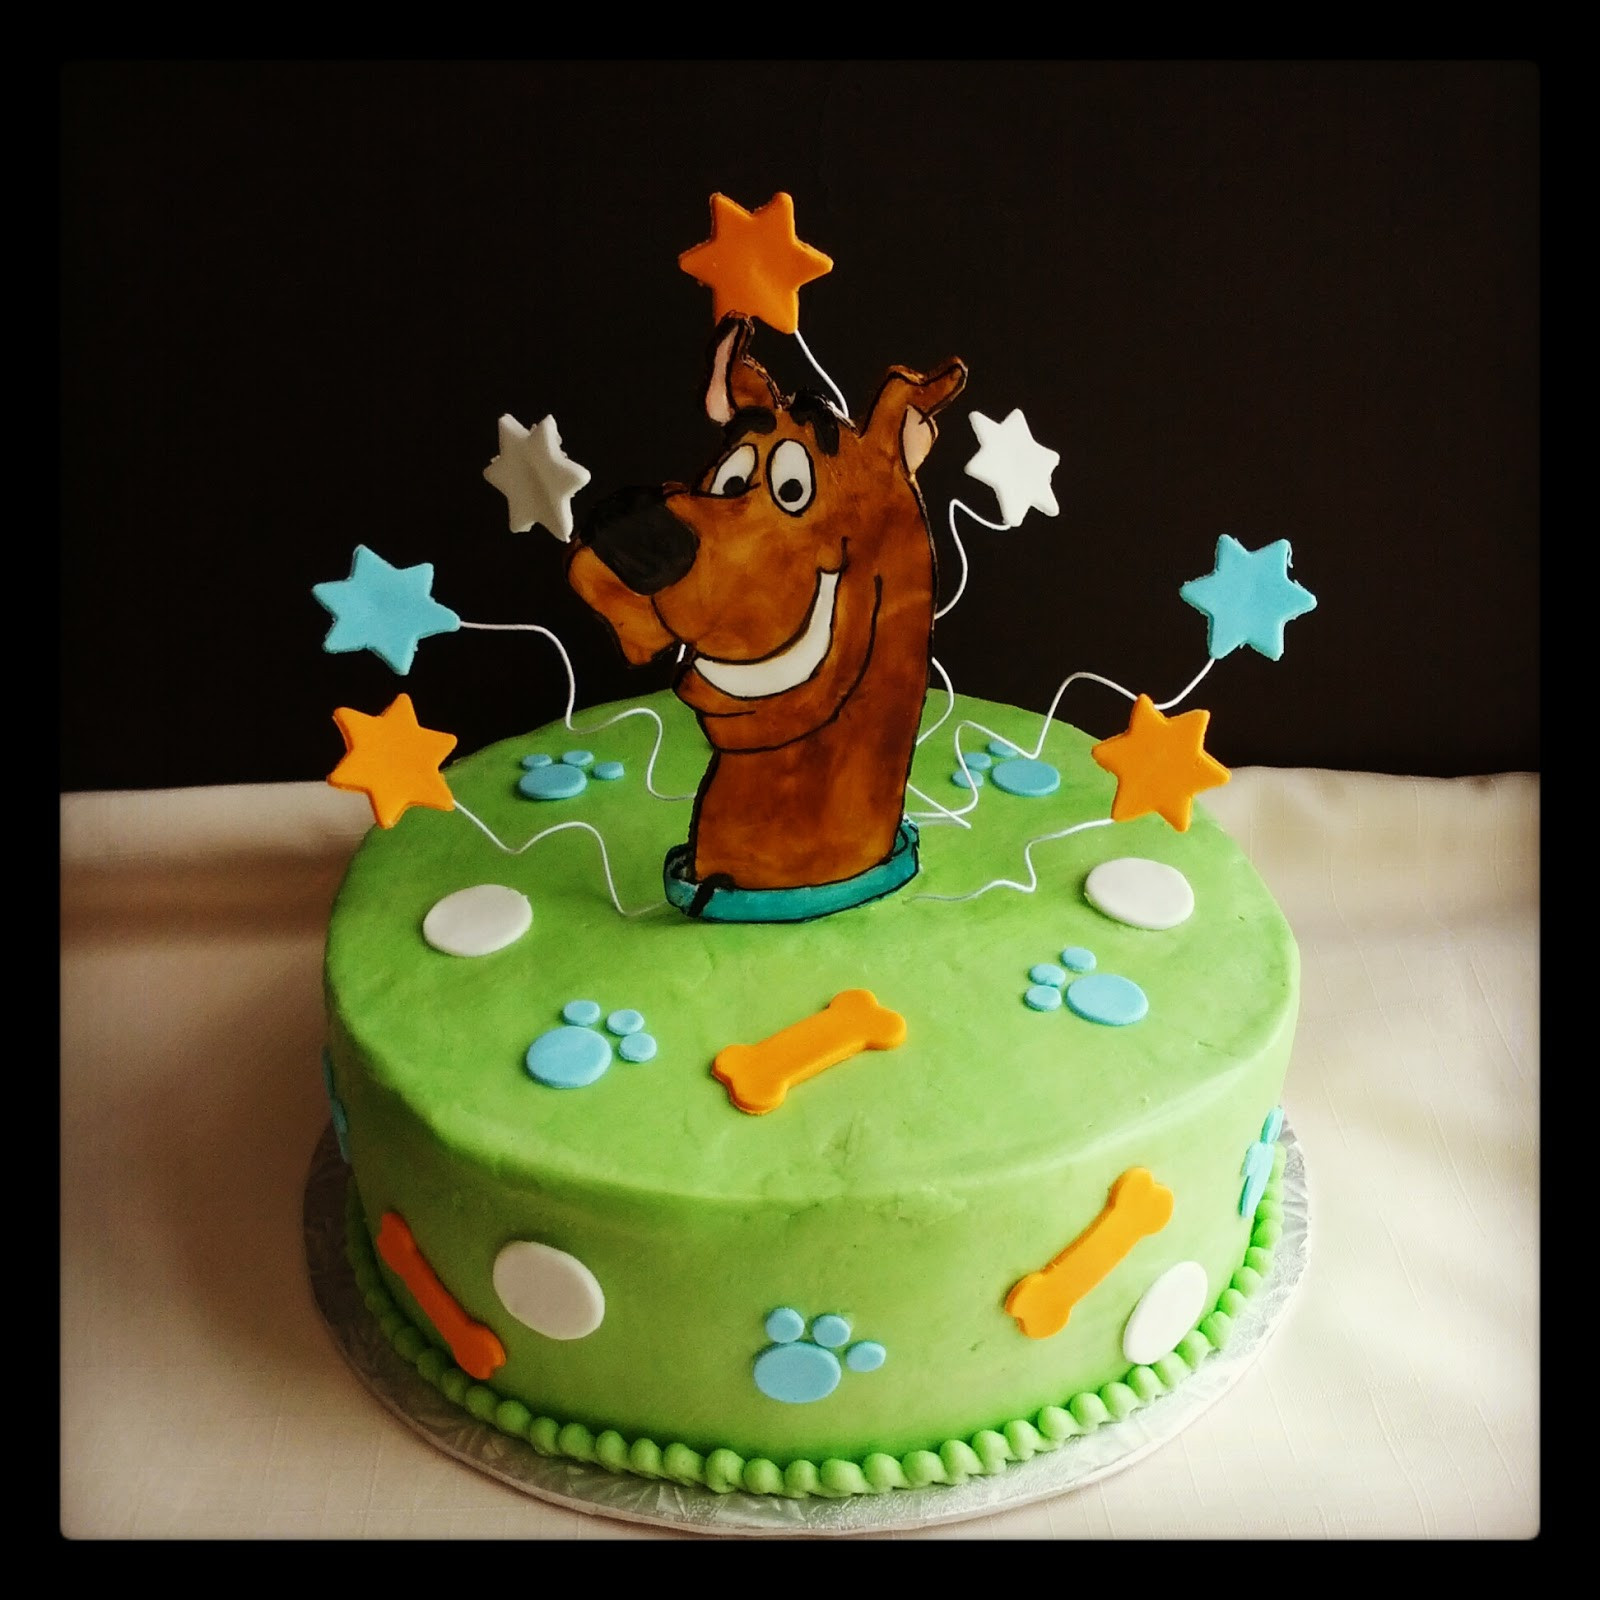 Scooby Doo Birthday Cakes  Second Generation Cake Design Scooby Doo Birthday Cake